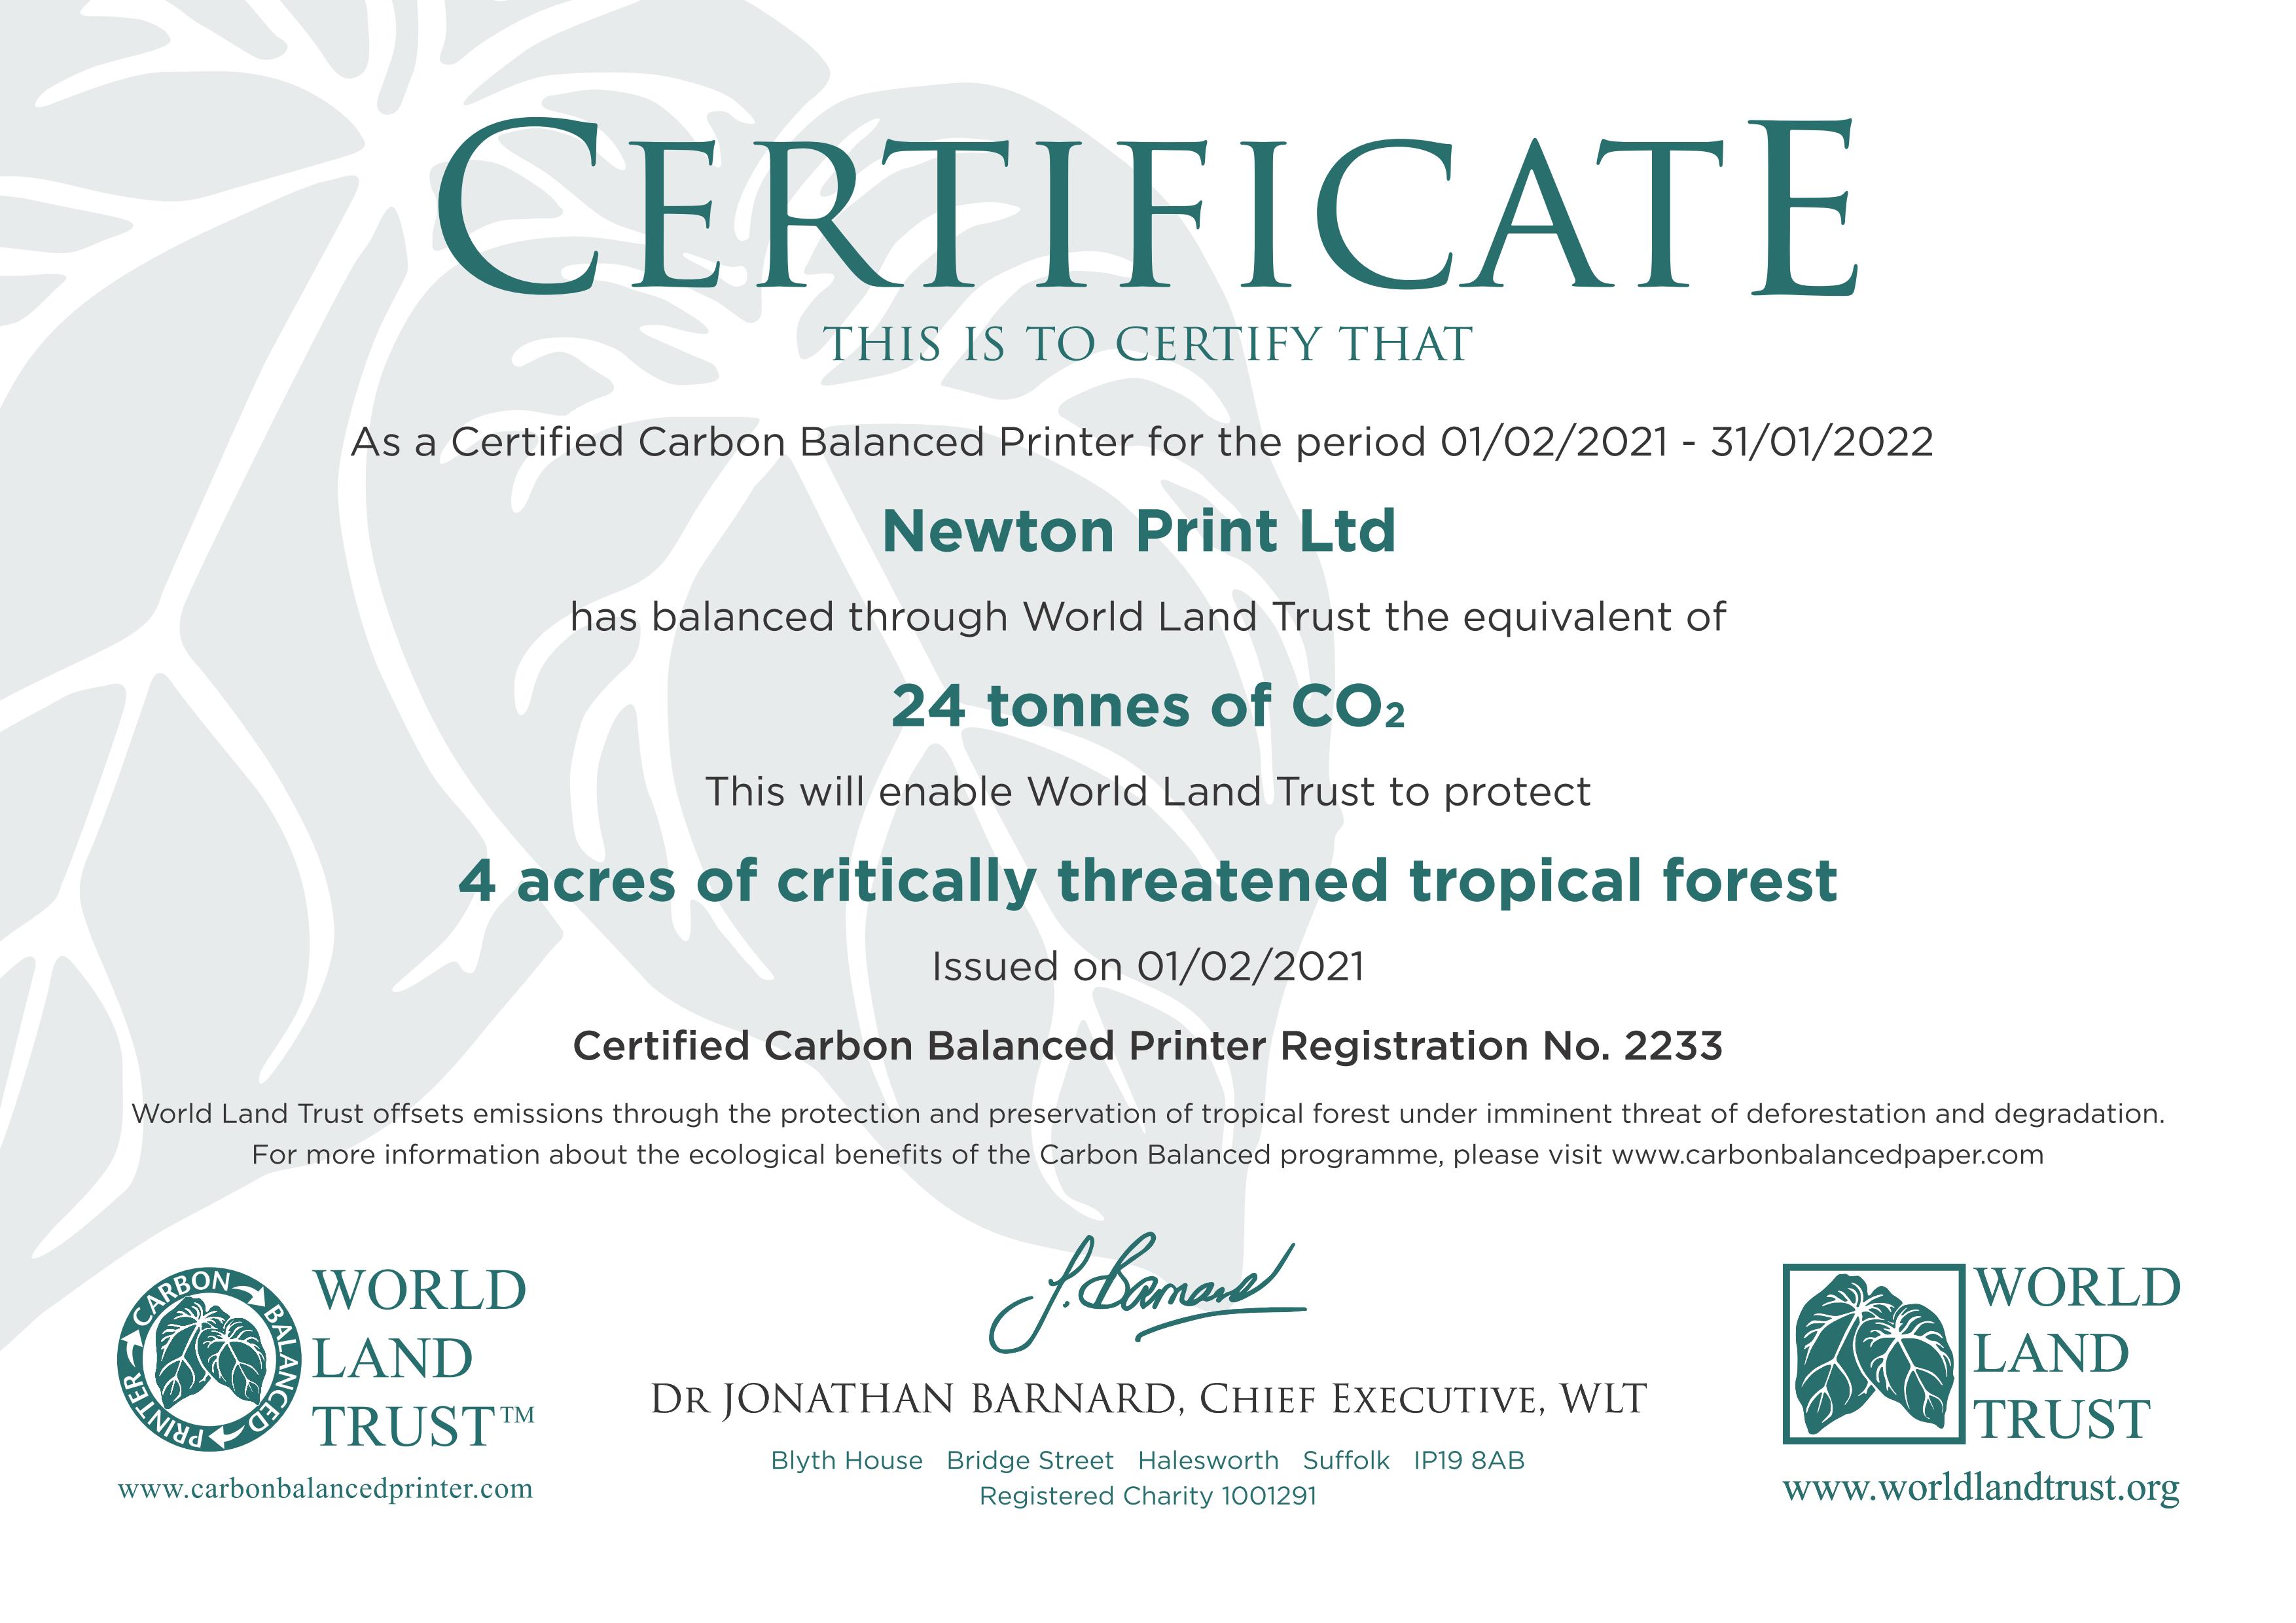 Carbon Balanced Printing Company and Paper - Newton Print